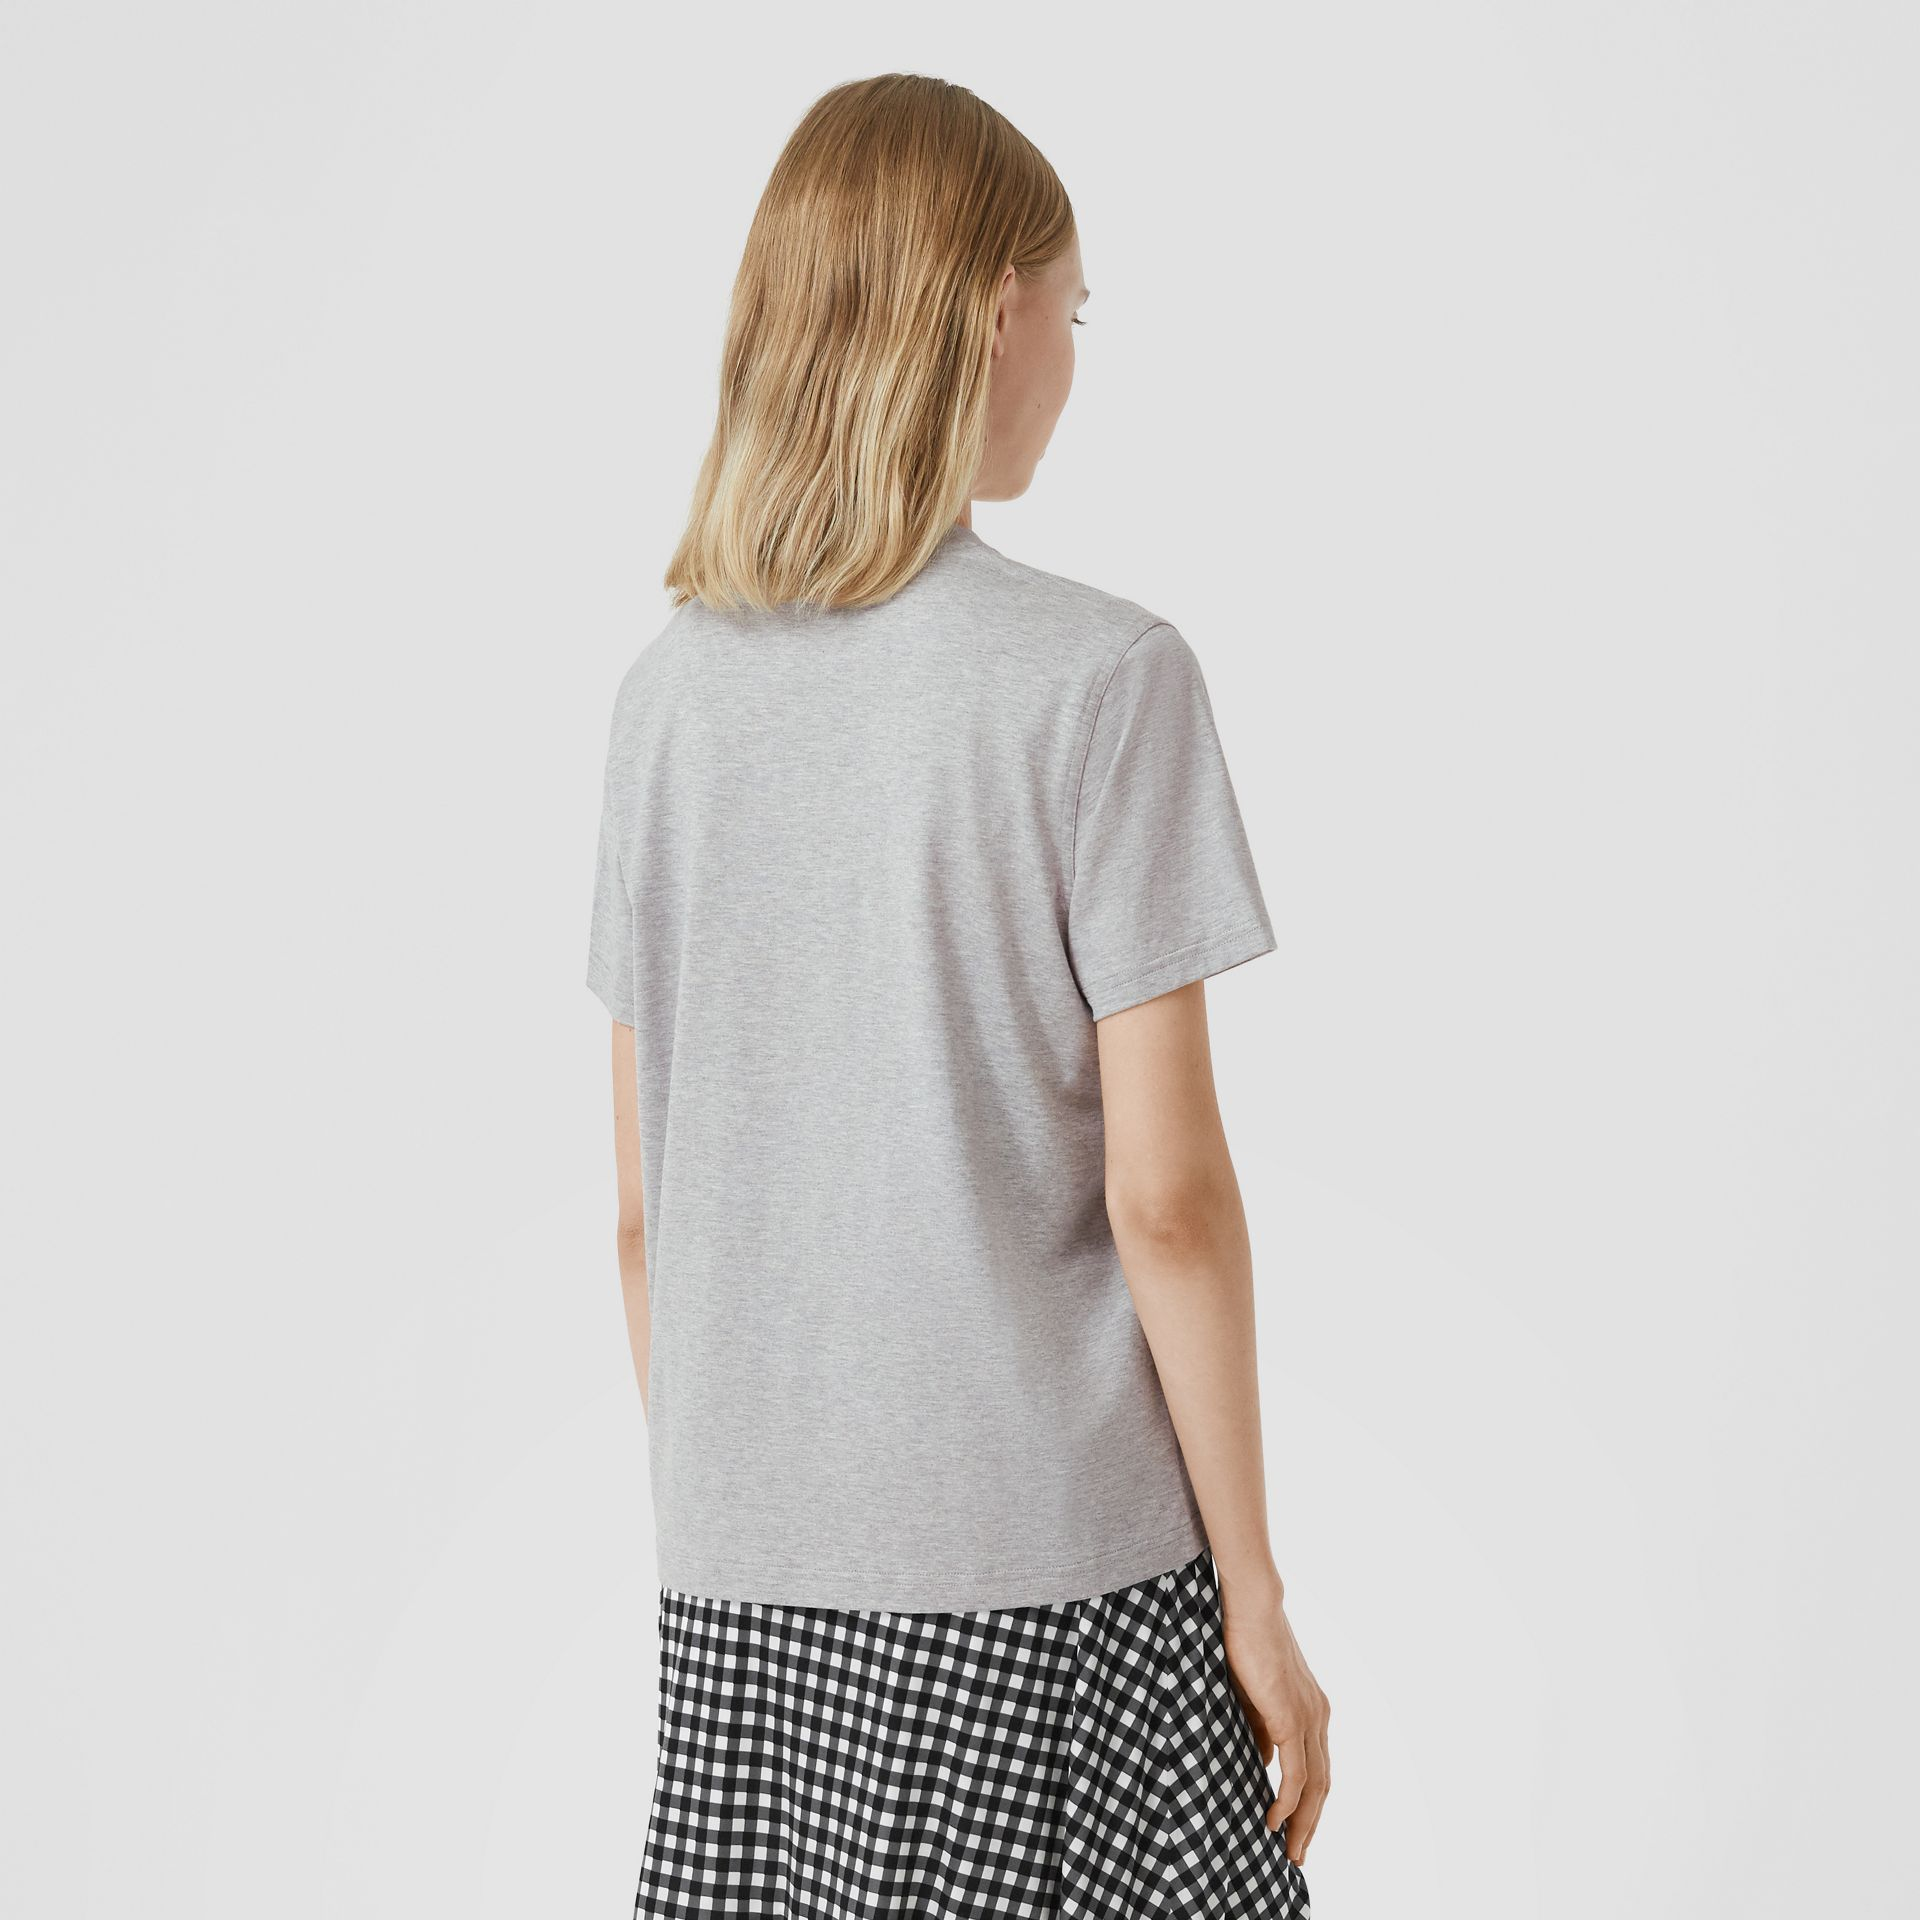 Monogram Motif Cotton T-shirt in Pale Grey Melange - Women | Burberry - gallery image 2